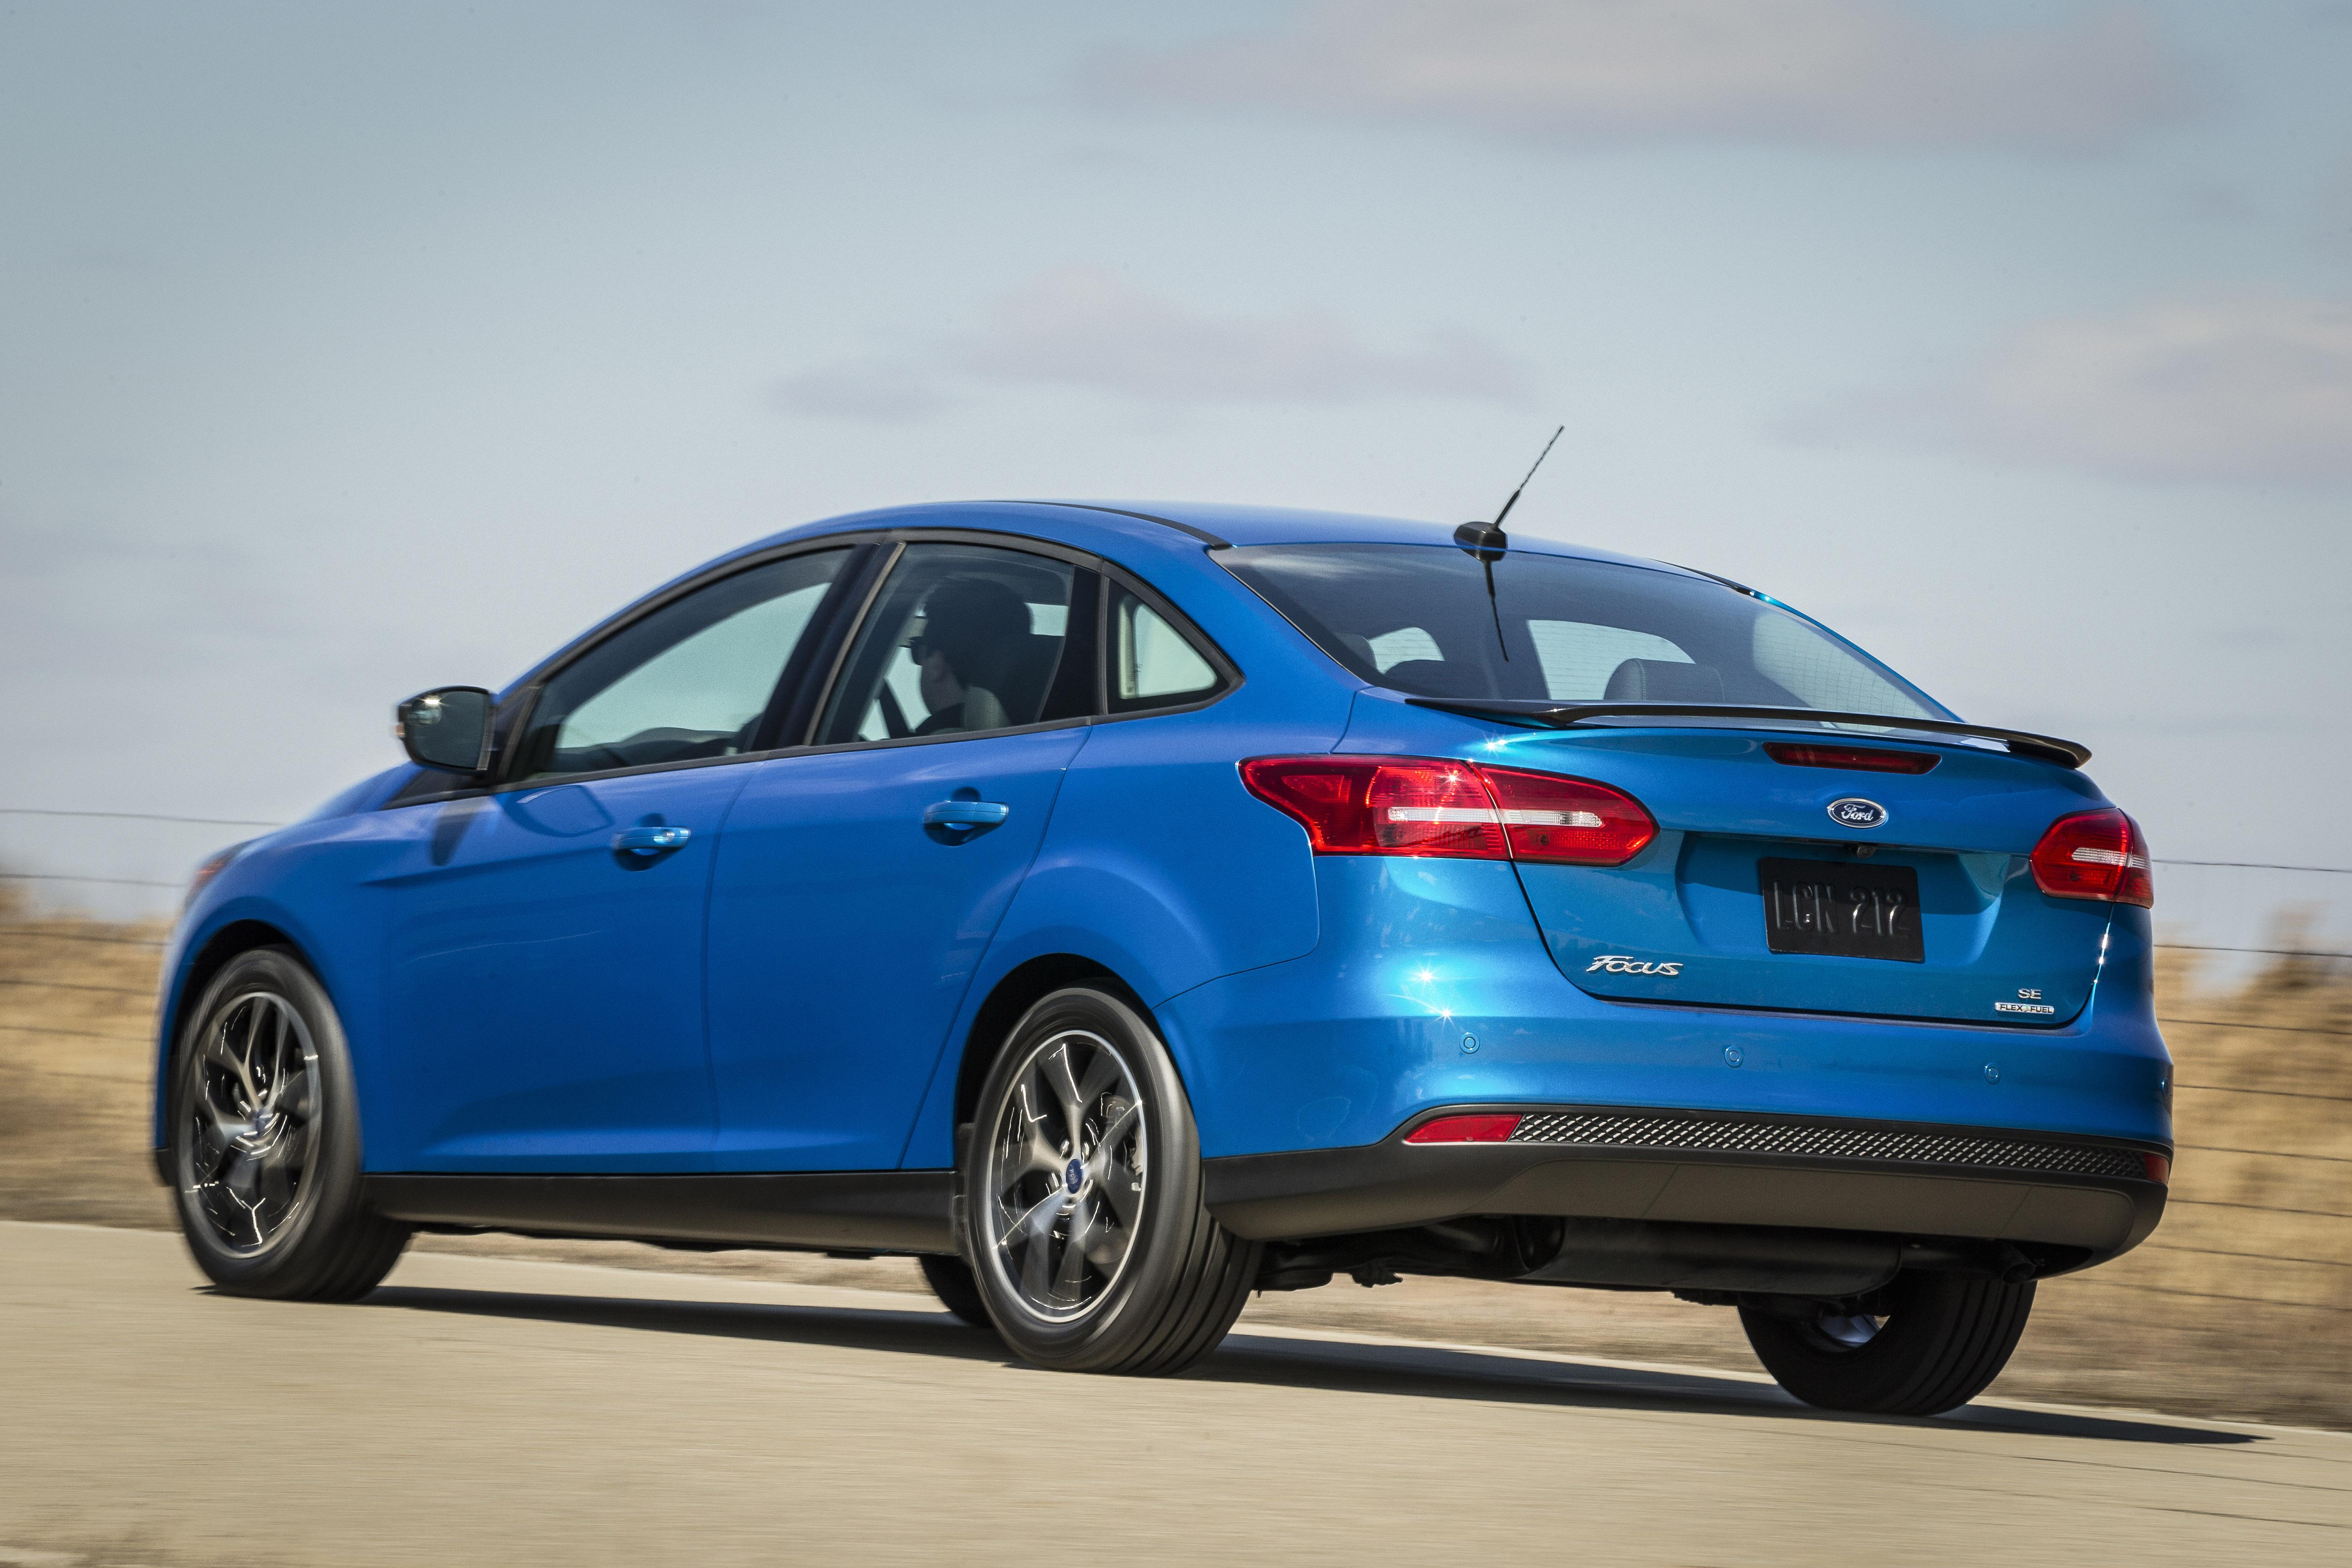 Focus for Car exterior design